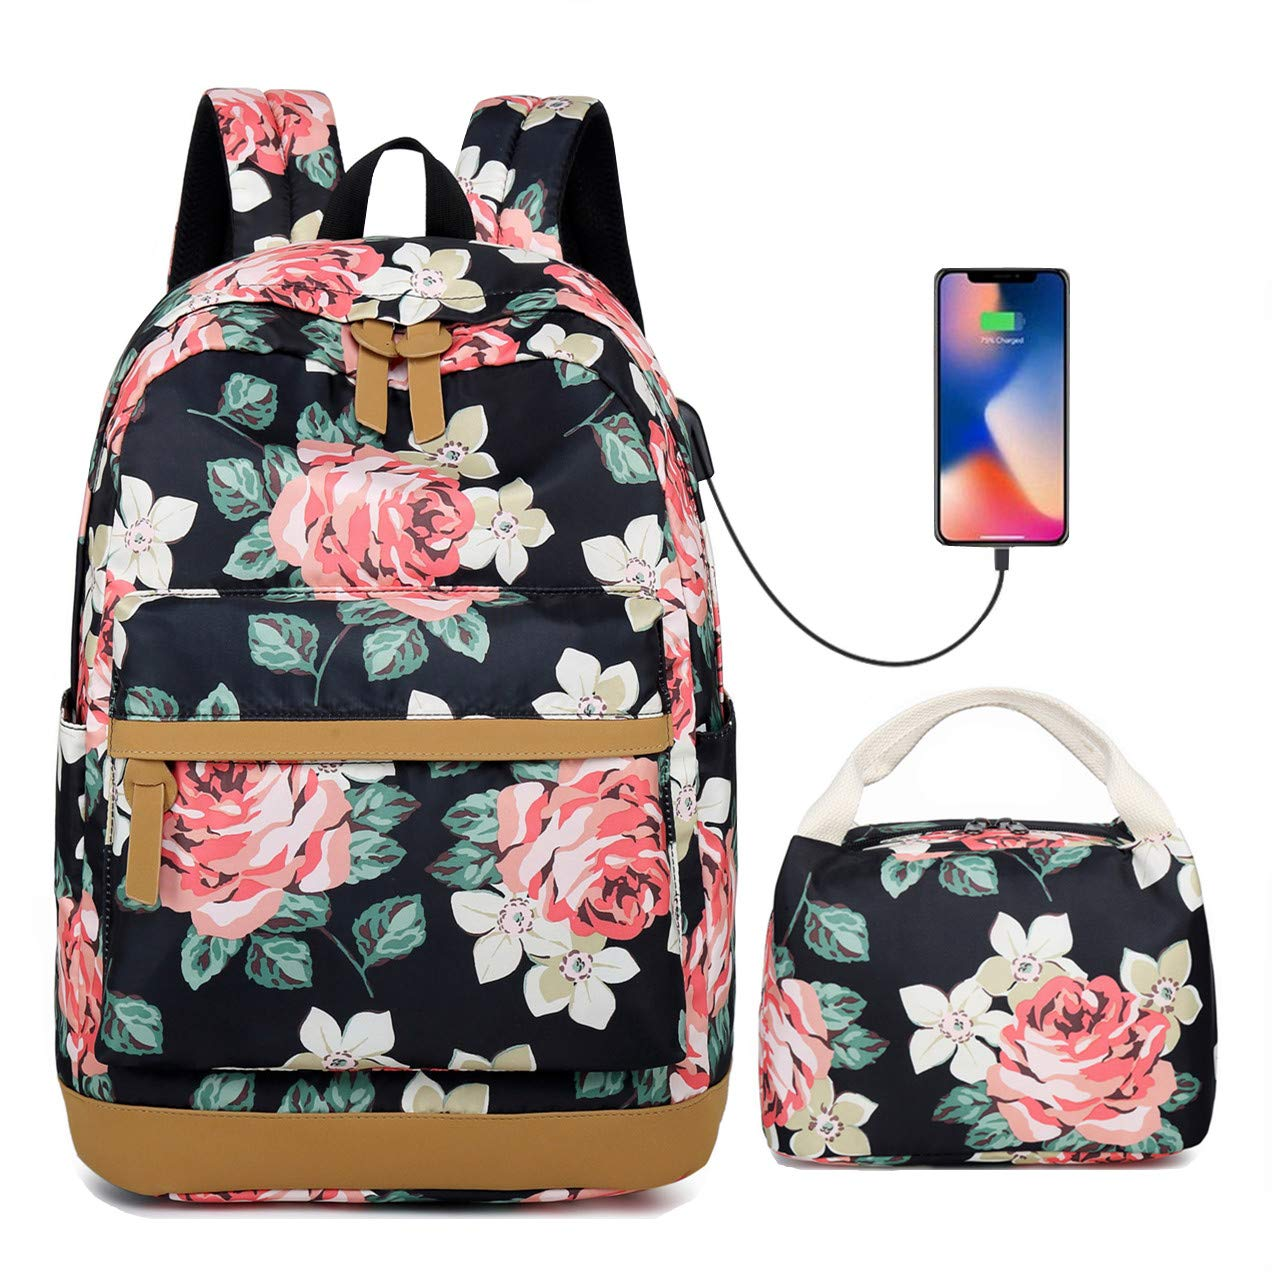 Teen Girl's Rose High School Bookbag College Backpack Set Shopping Travel Rucksack 15Inch Laptop Bag with USB Charging Port Floral